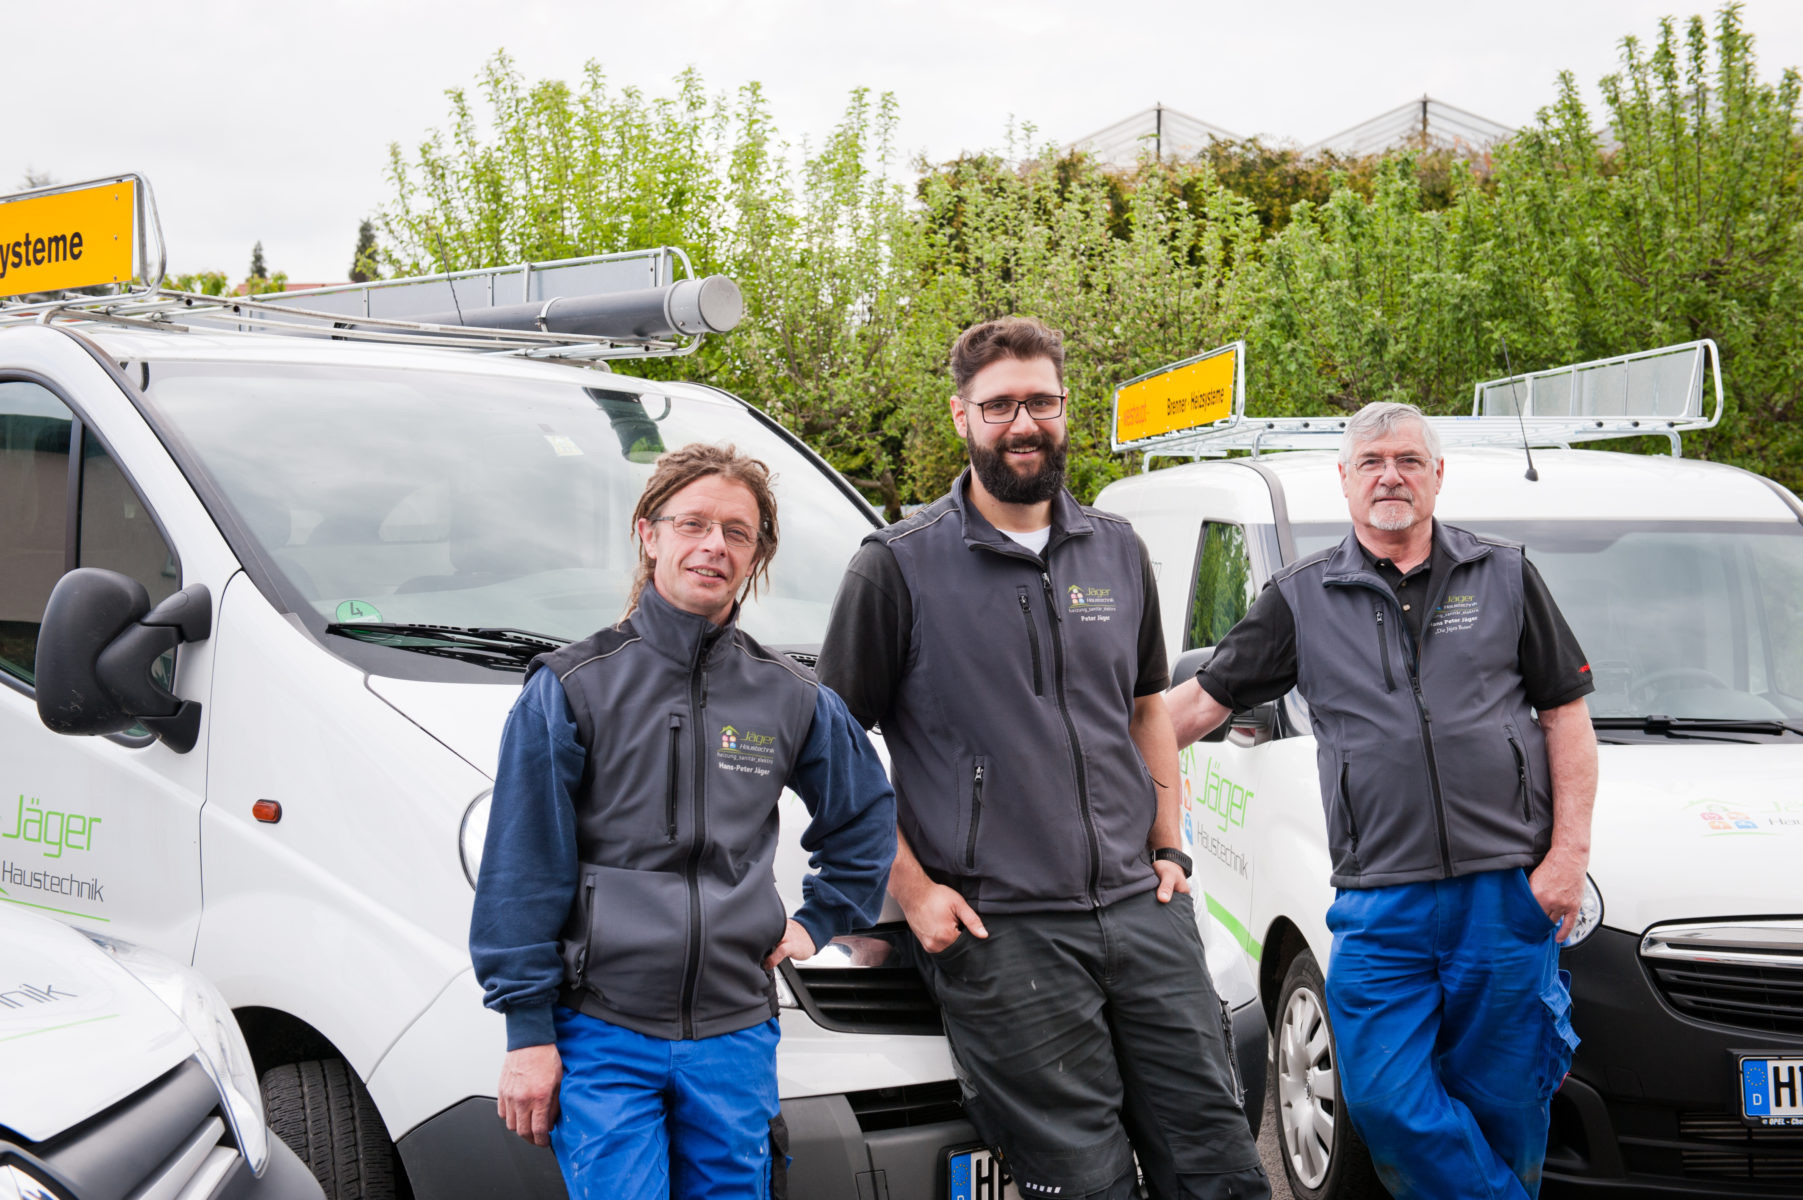 Sanitär Darmstadt  Jäger Haustechnik GmbH reinheimer systemloesungen IT